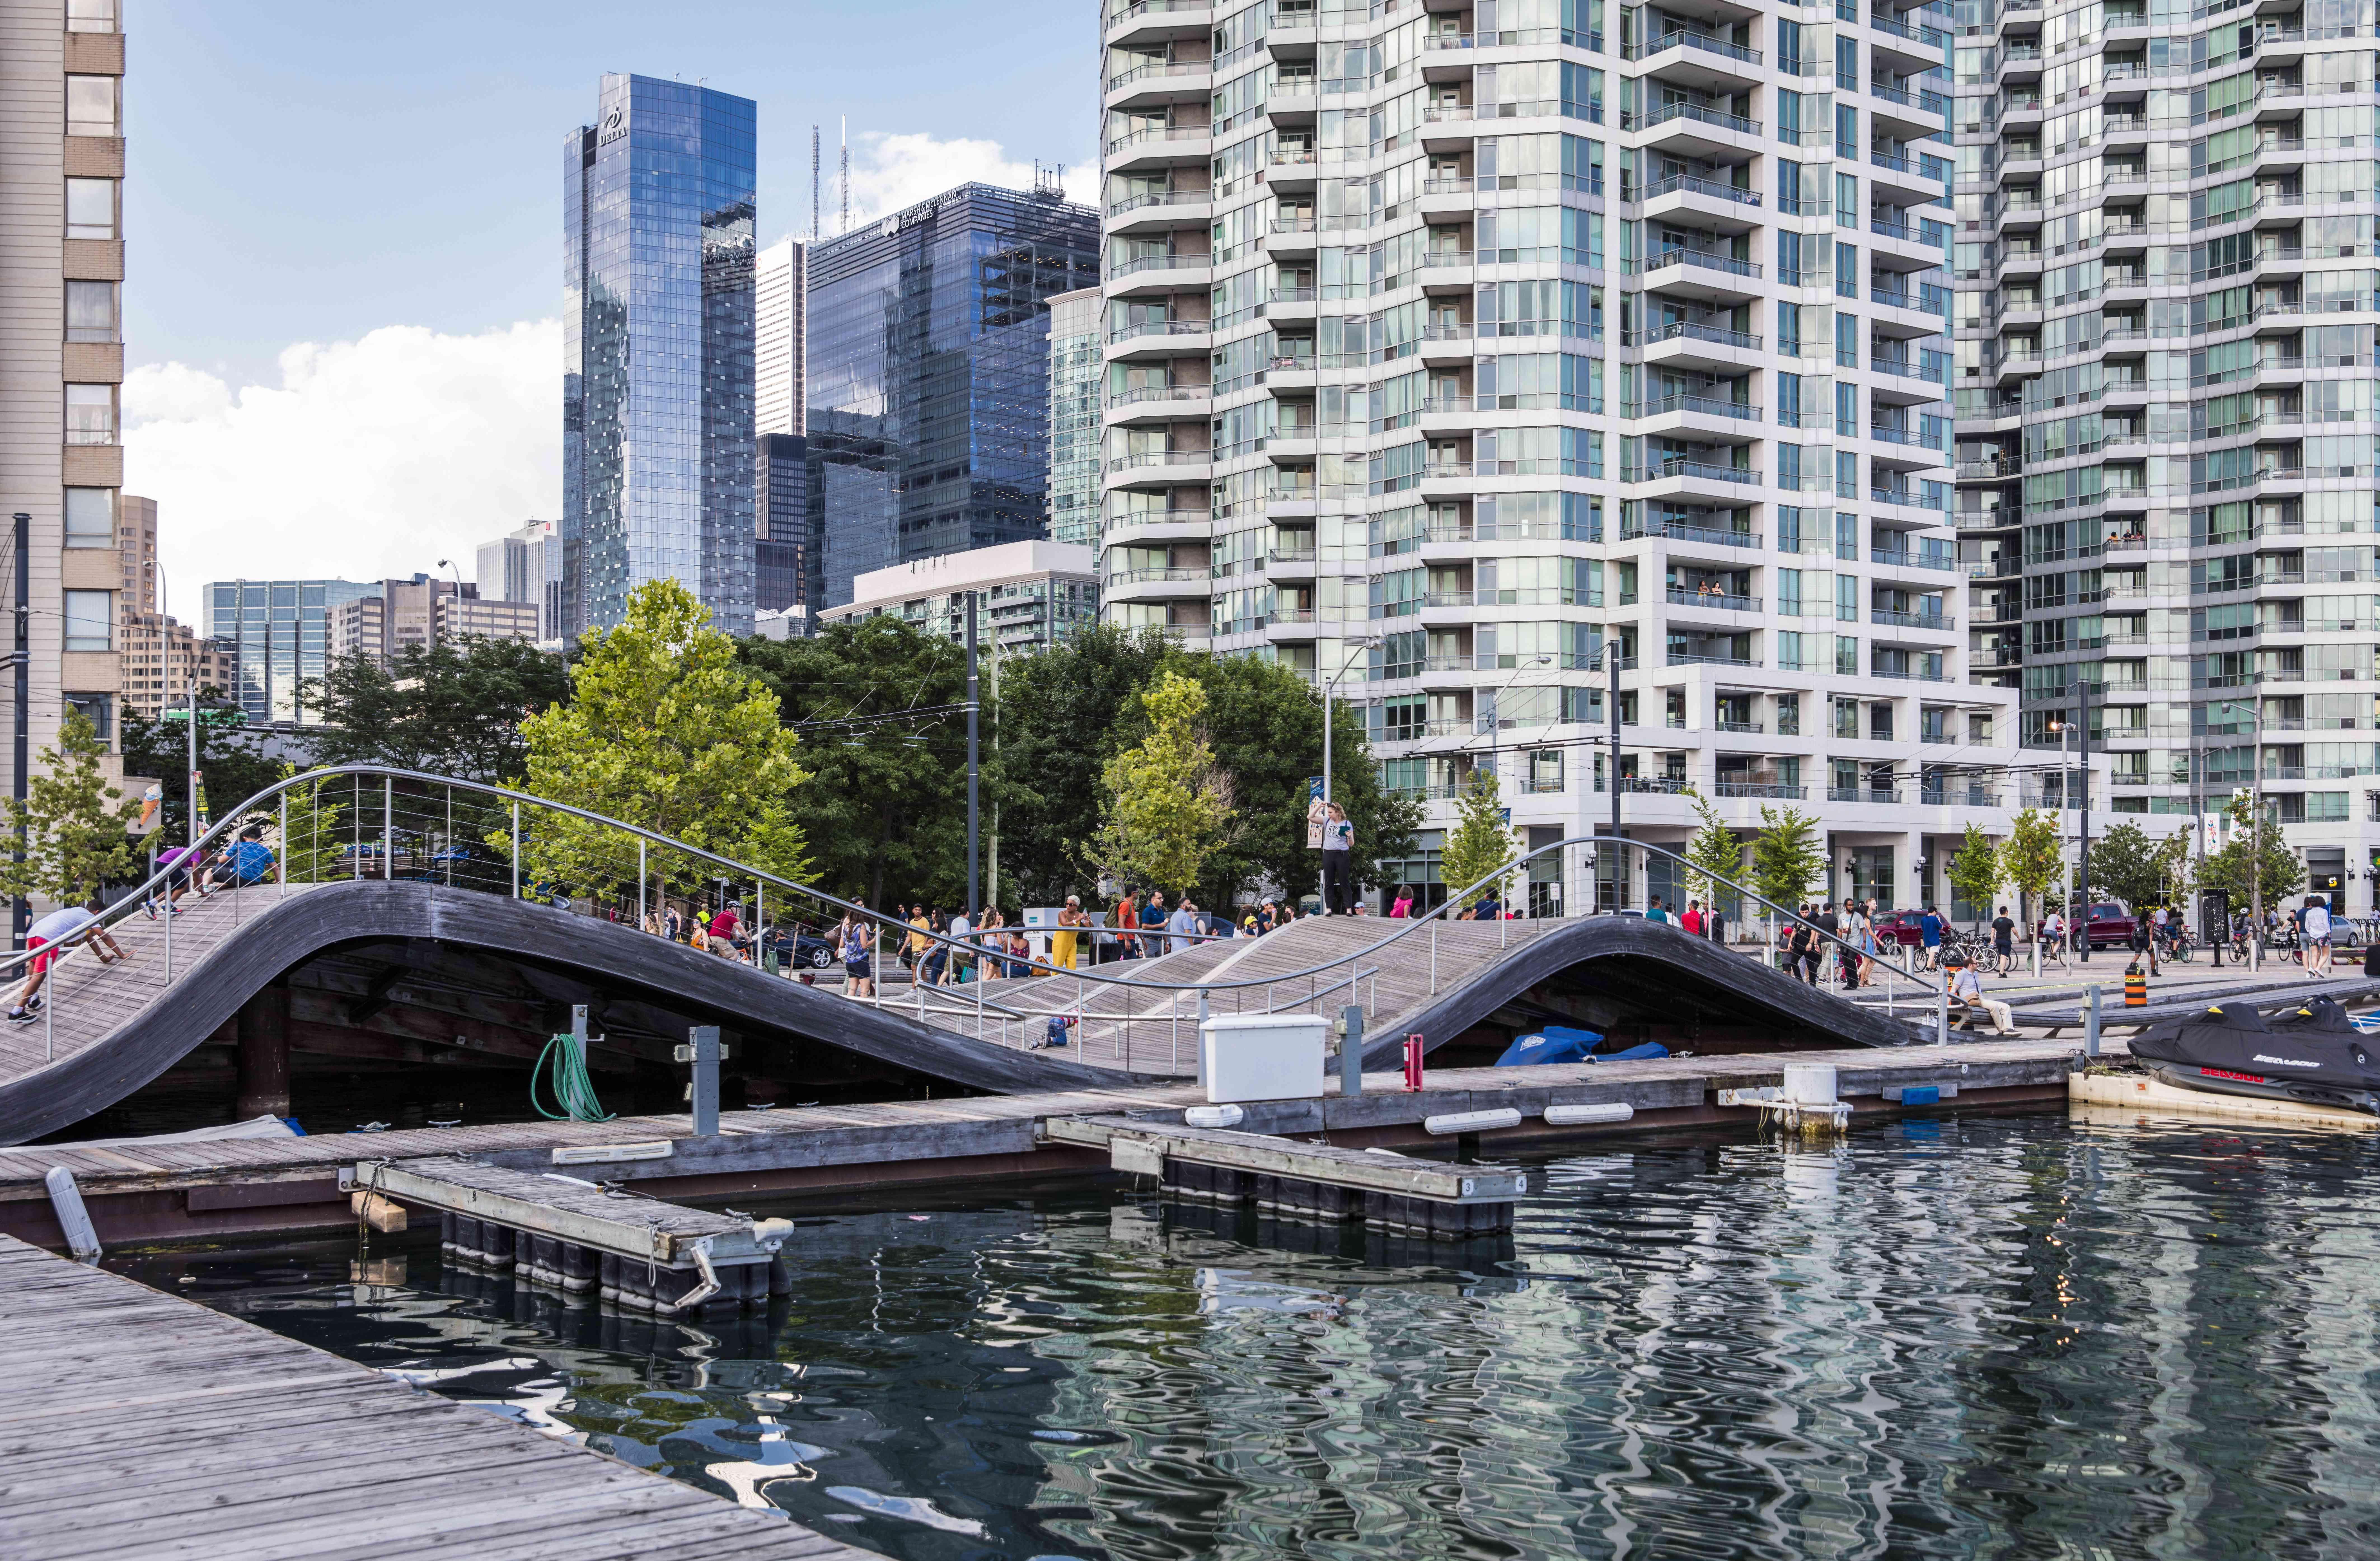 Simecoe Wave Deck in Toronto